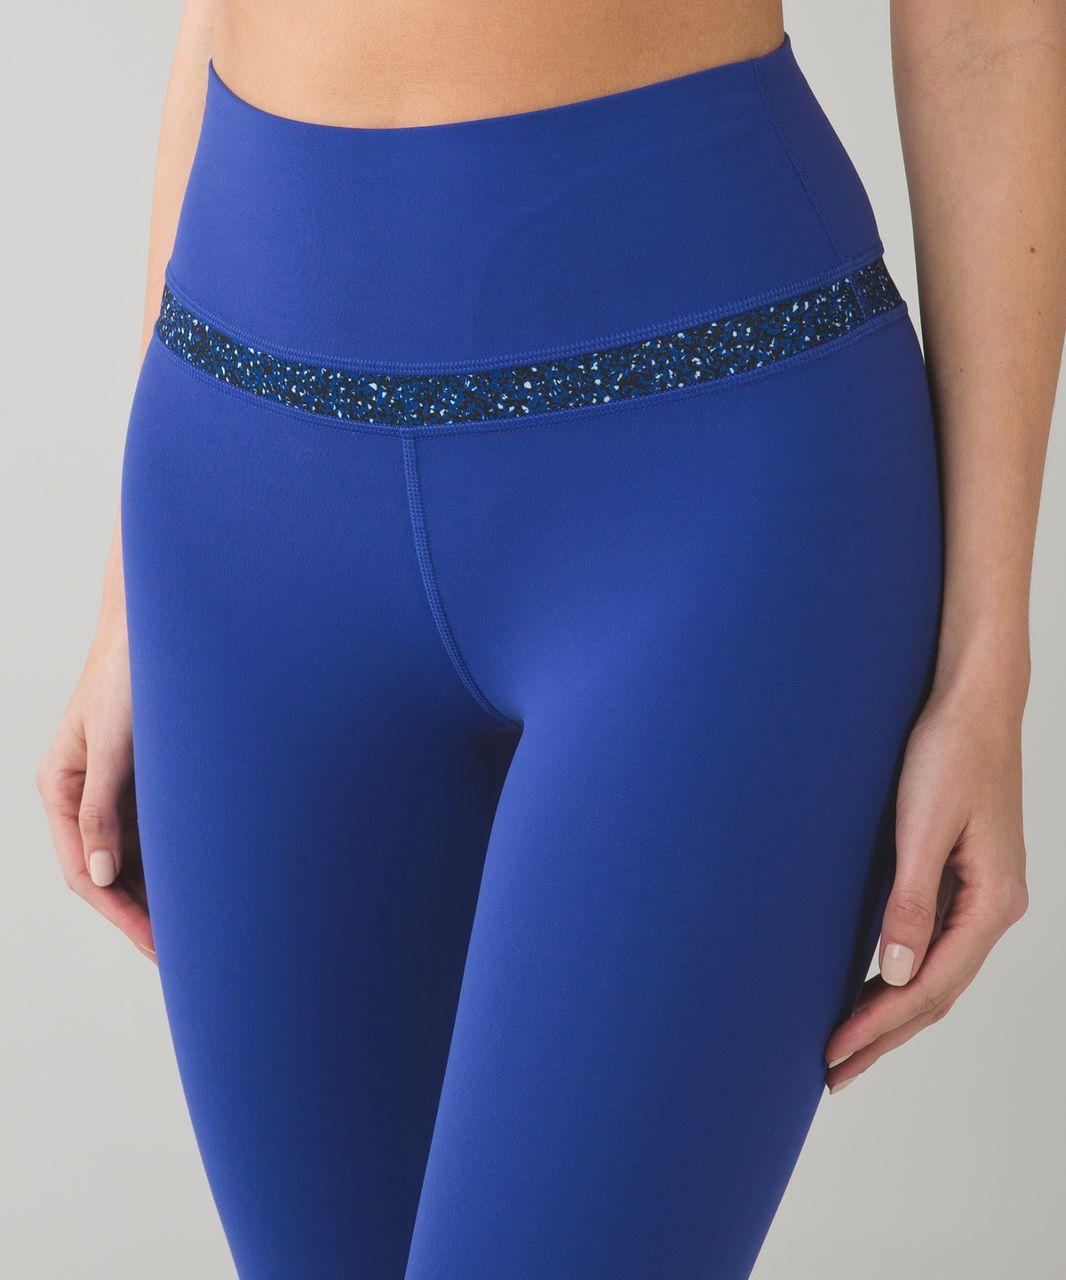 Lululemon Align Pant - Sapphire Blue / Flashback Static Caspian Blue Sapphire Blue